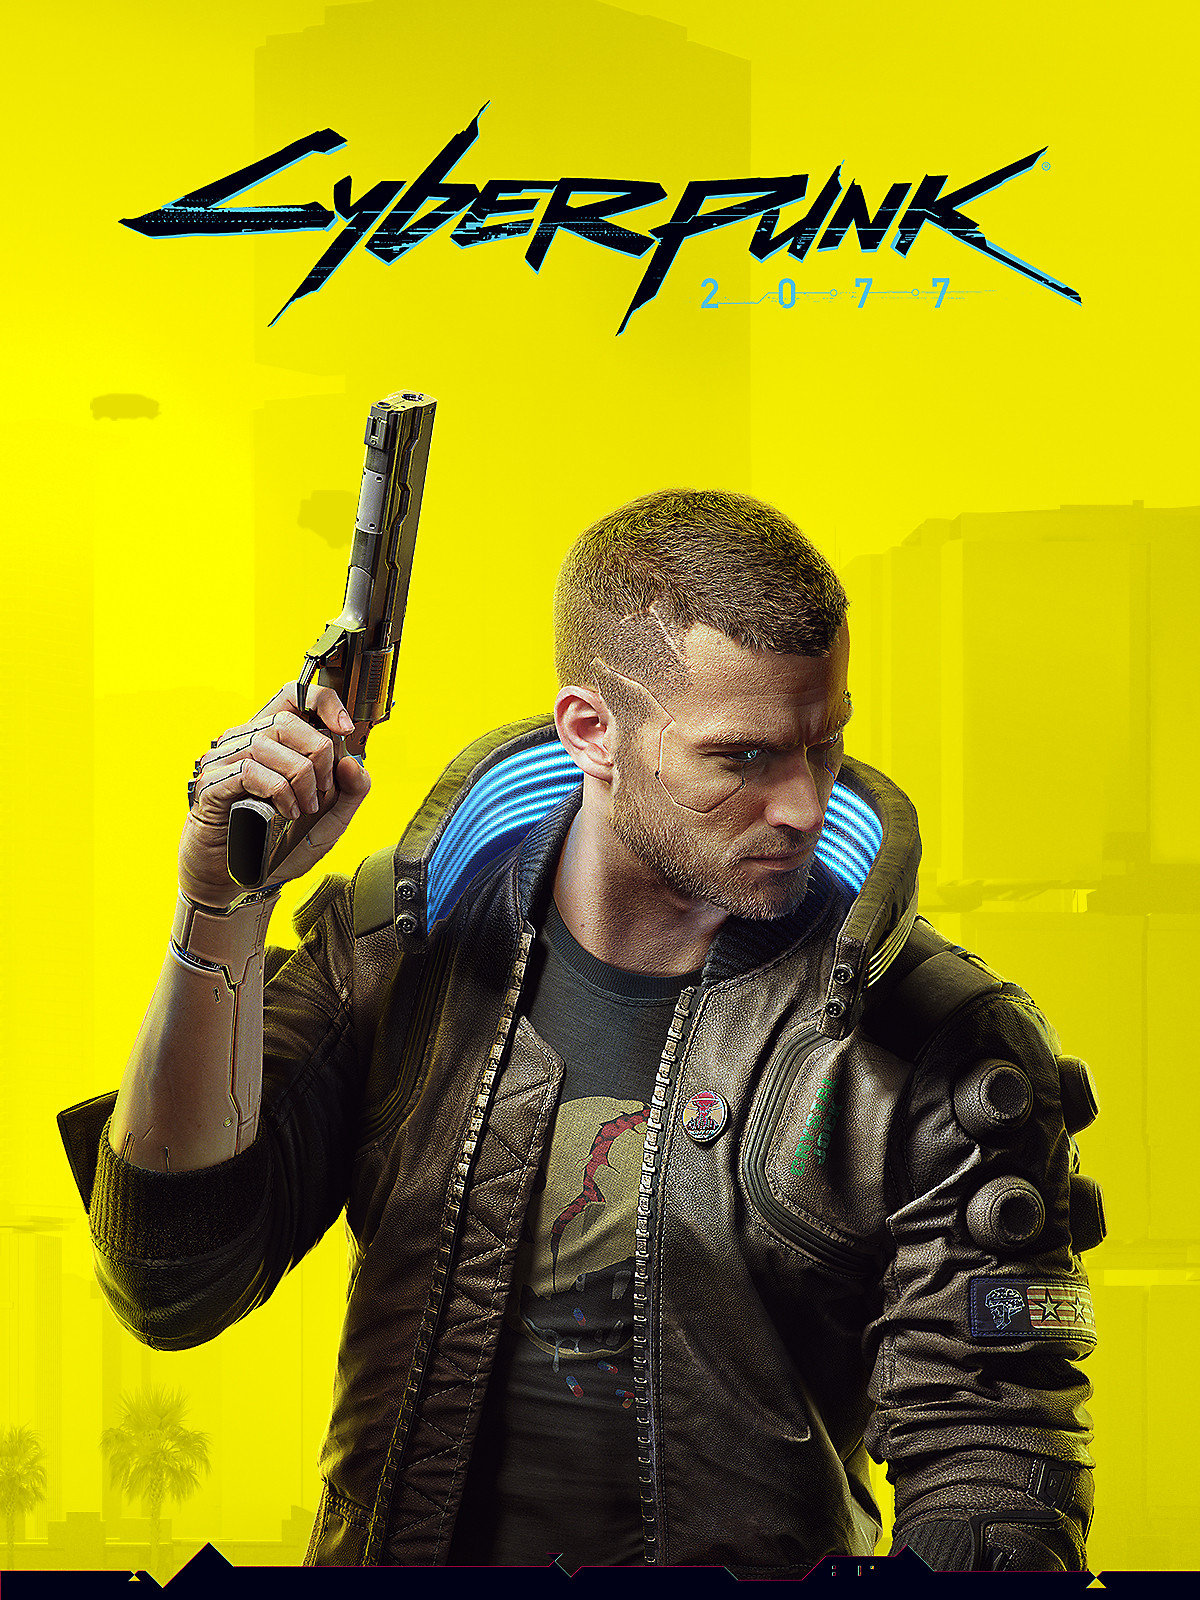 Poster for Cyberpunk 2077